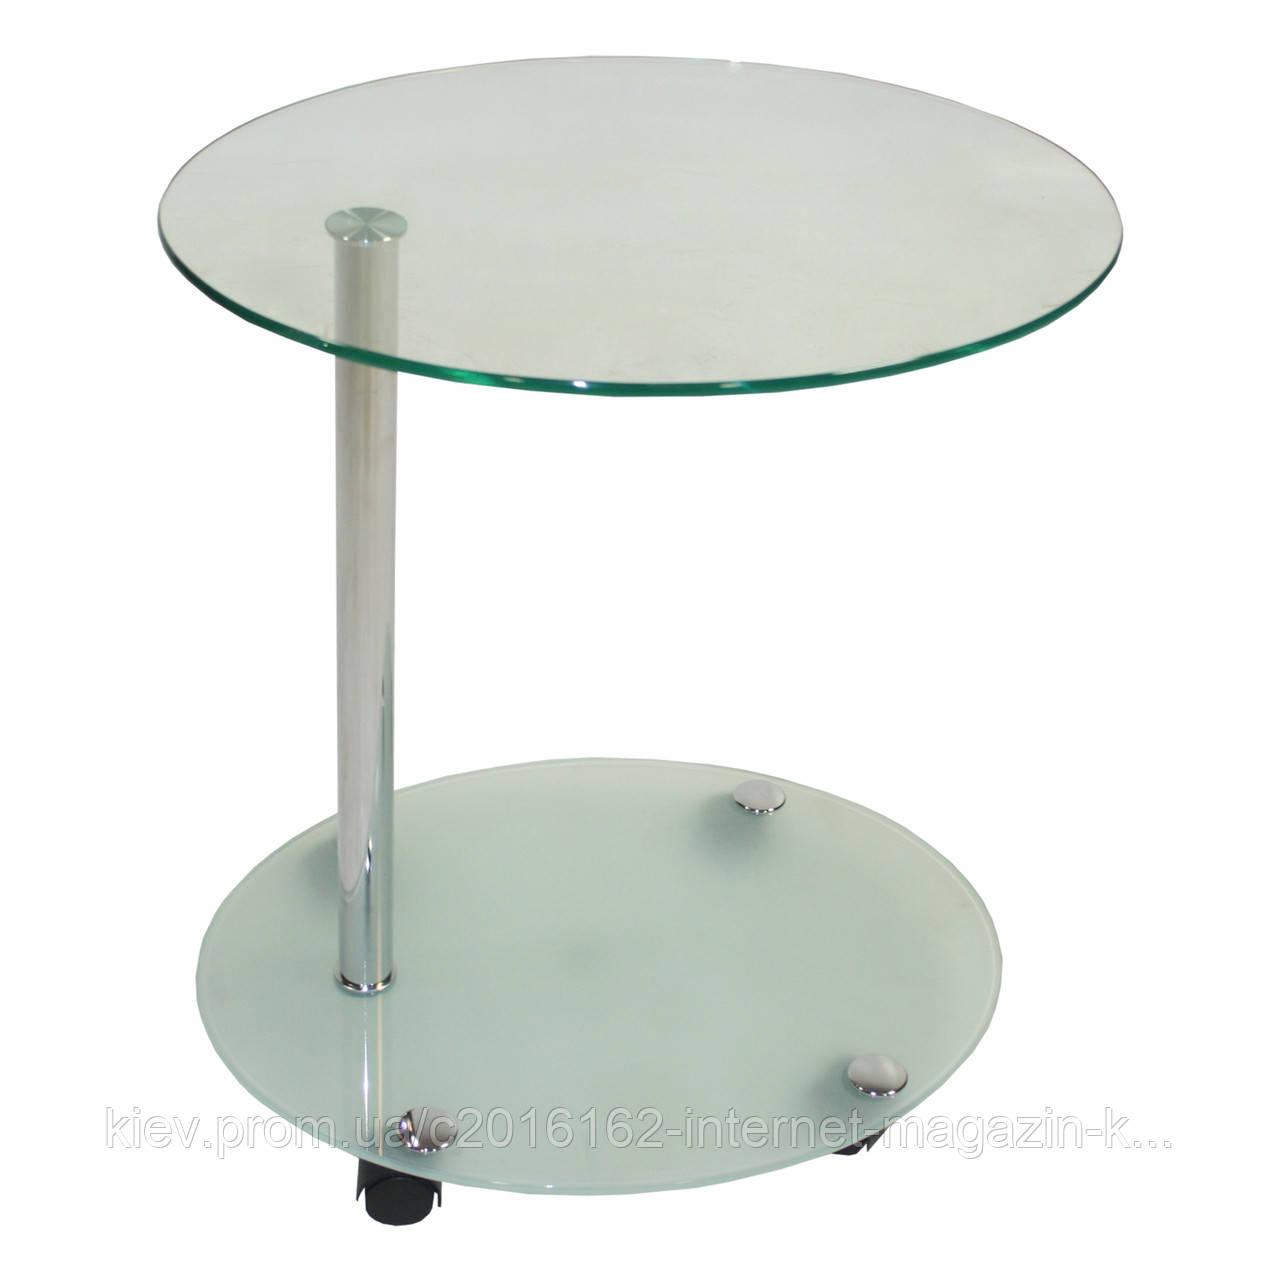 Туалетный столик Home4You LUCIA  39x49xH54cm  tempered transparent glass  chrome